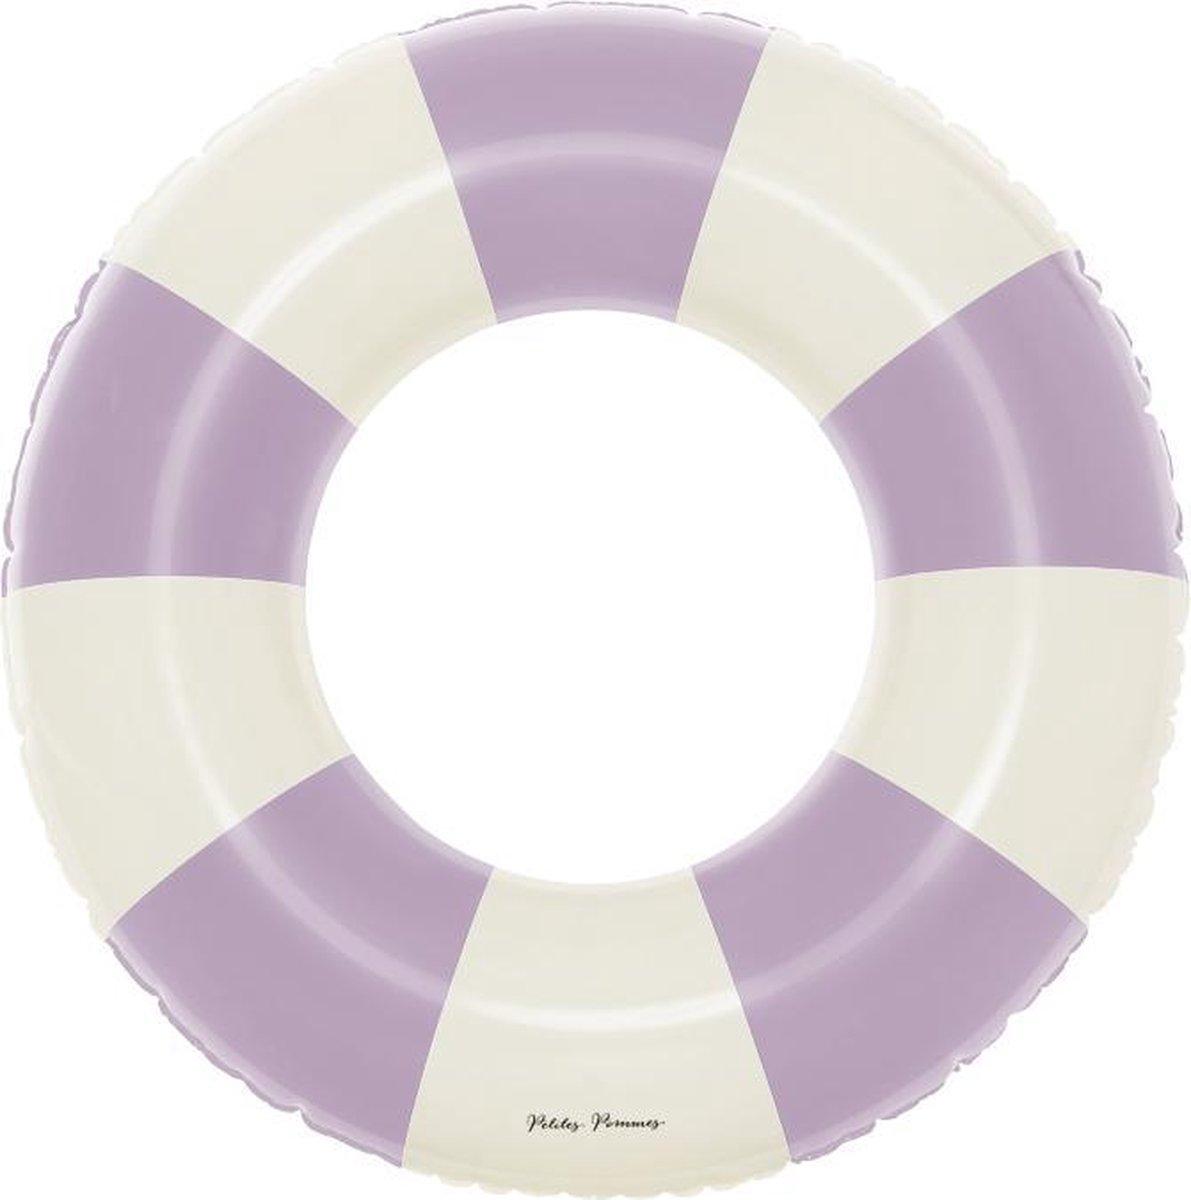 Petites Pommes Zwemring Celine Grand Float Violet - Zwemband - ø 120cm - 6+ jaar